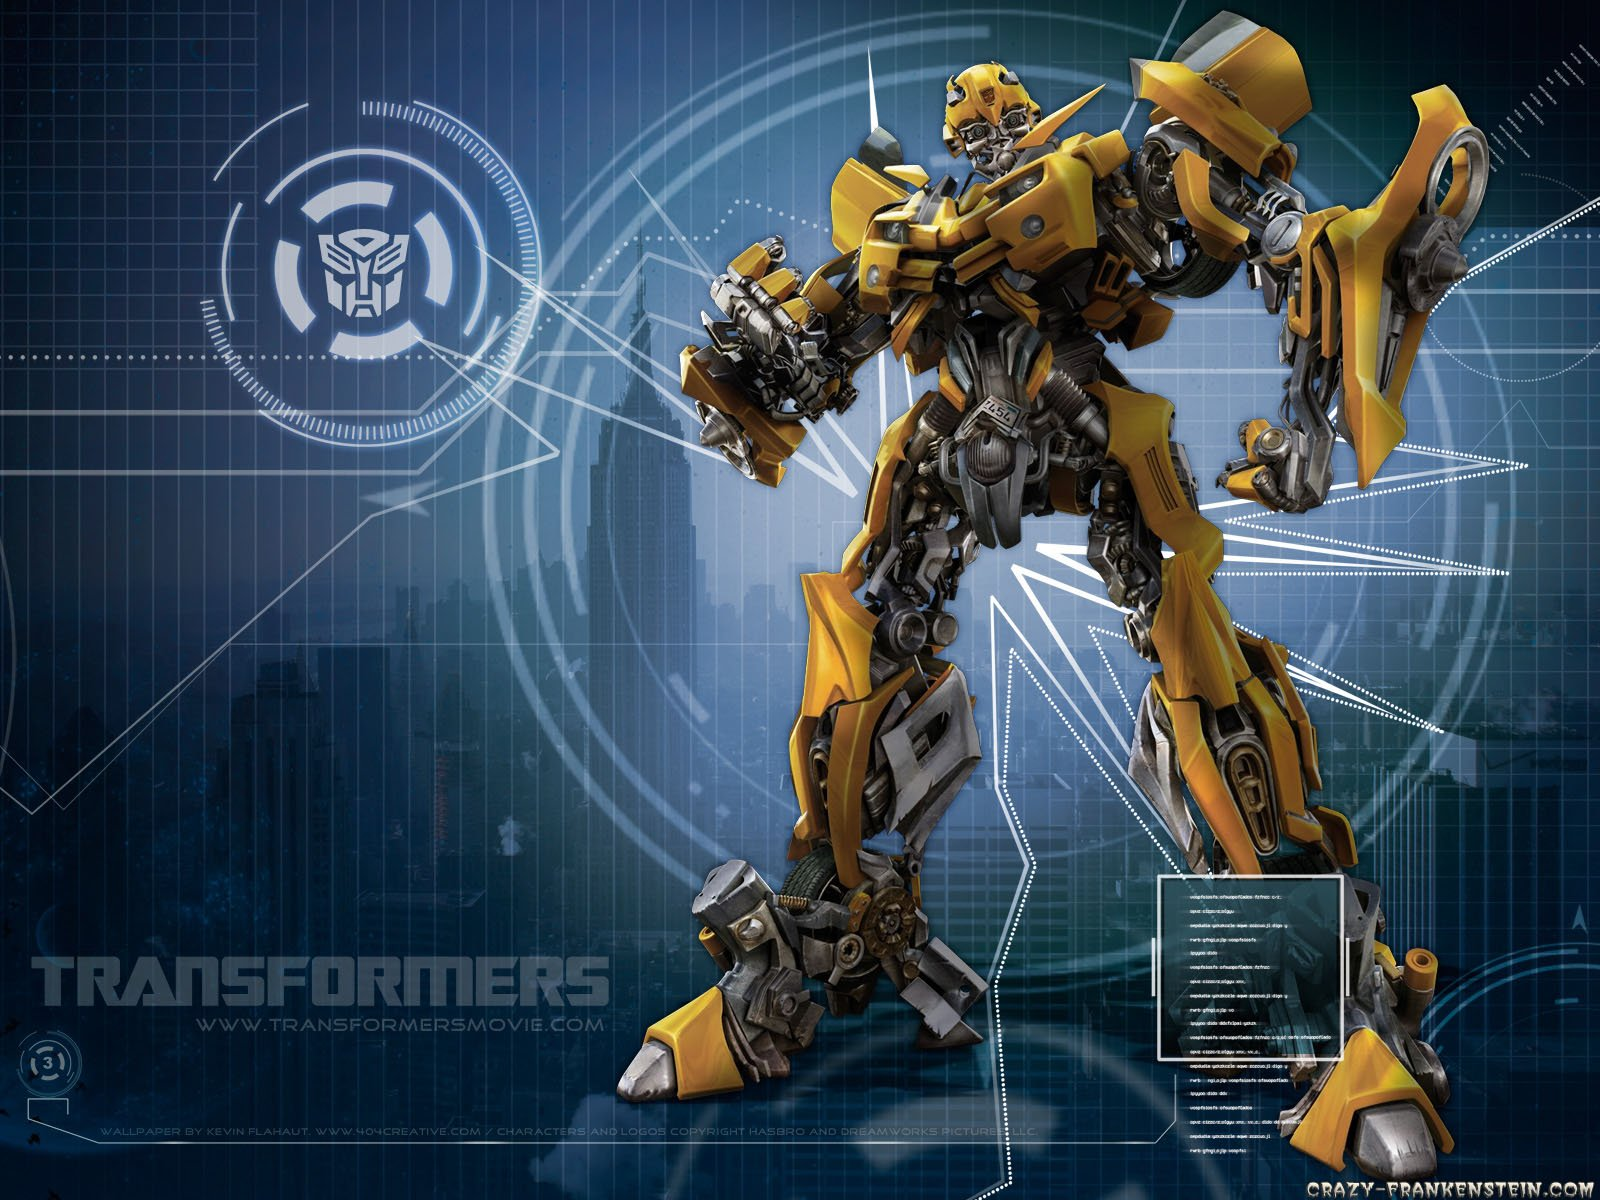 47 ] Live 3D Wallpaper Transformers On WallpaperSafari